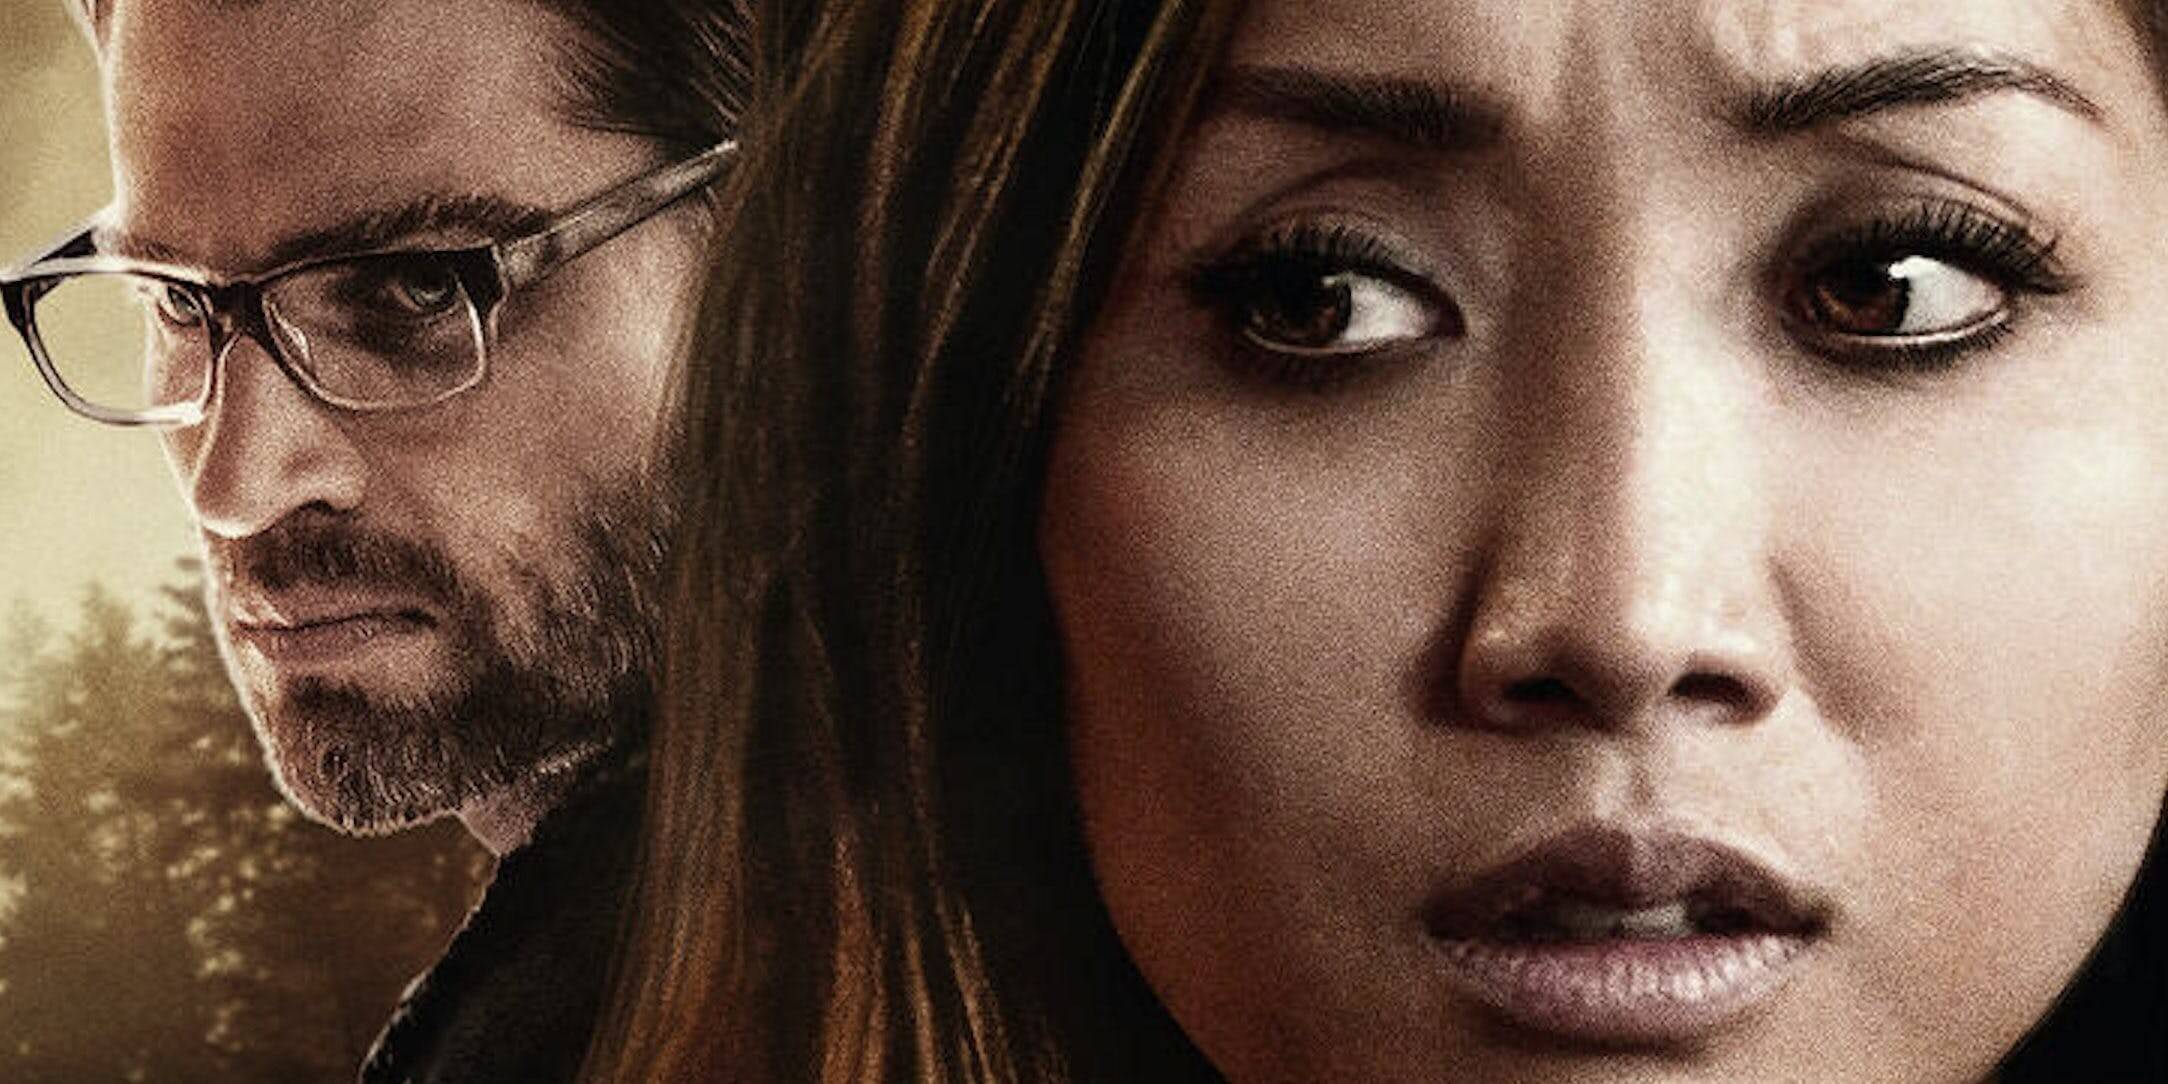 Secret-Obsession-Netflix-Poster-Cropped-e1562598908952